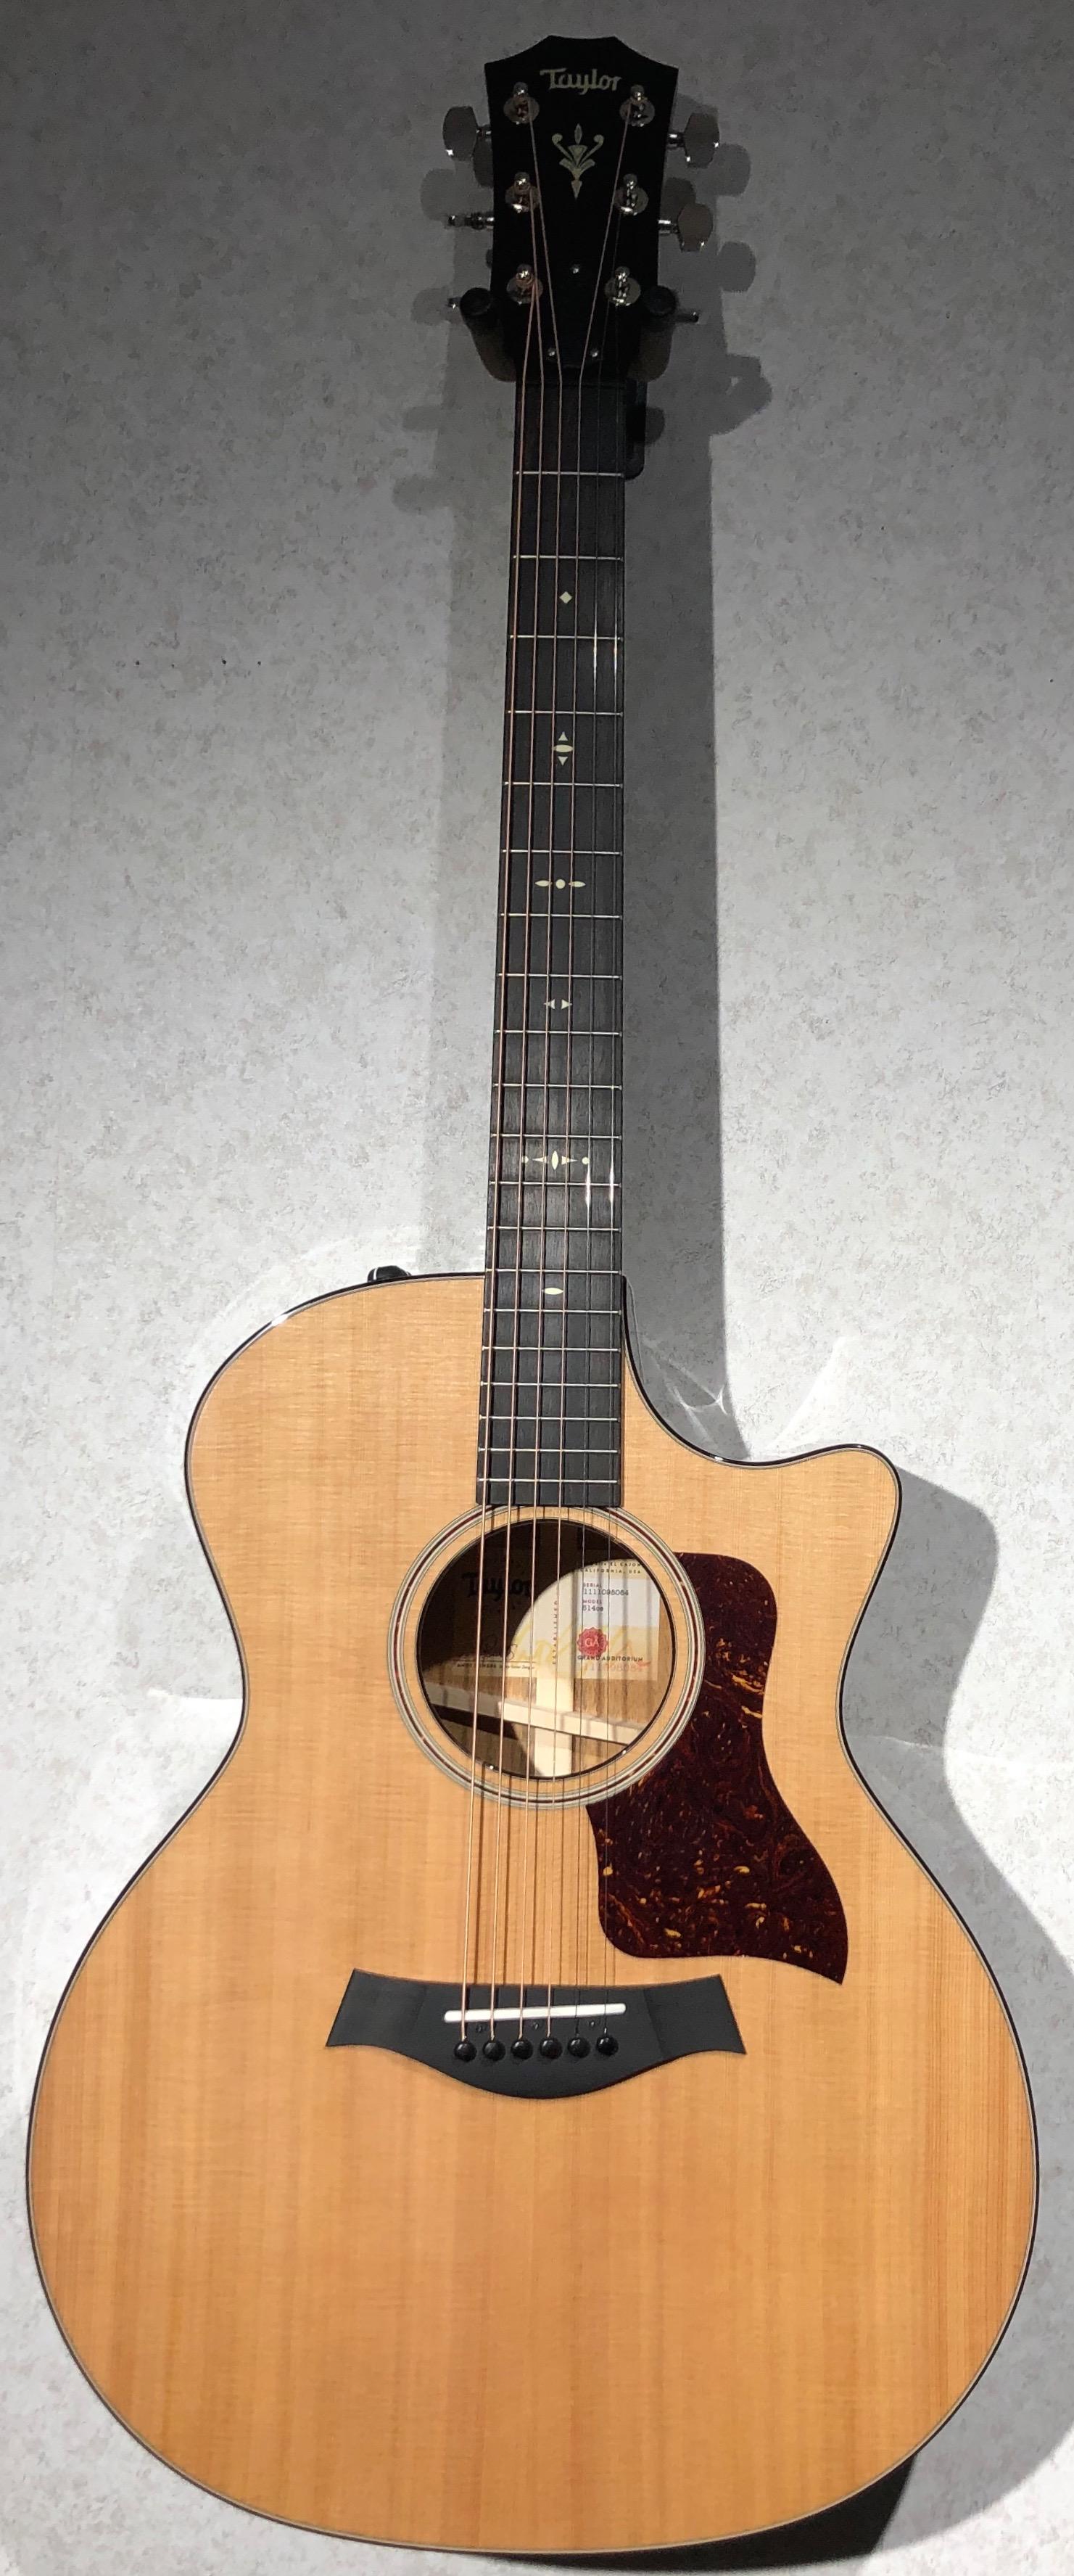 taylor guitars 514ce v class legacy music. Black Bedroom Furniture Sets. Home Design Ideas